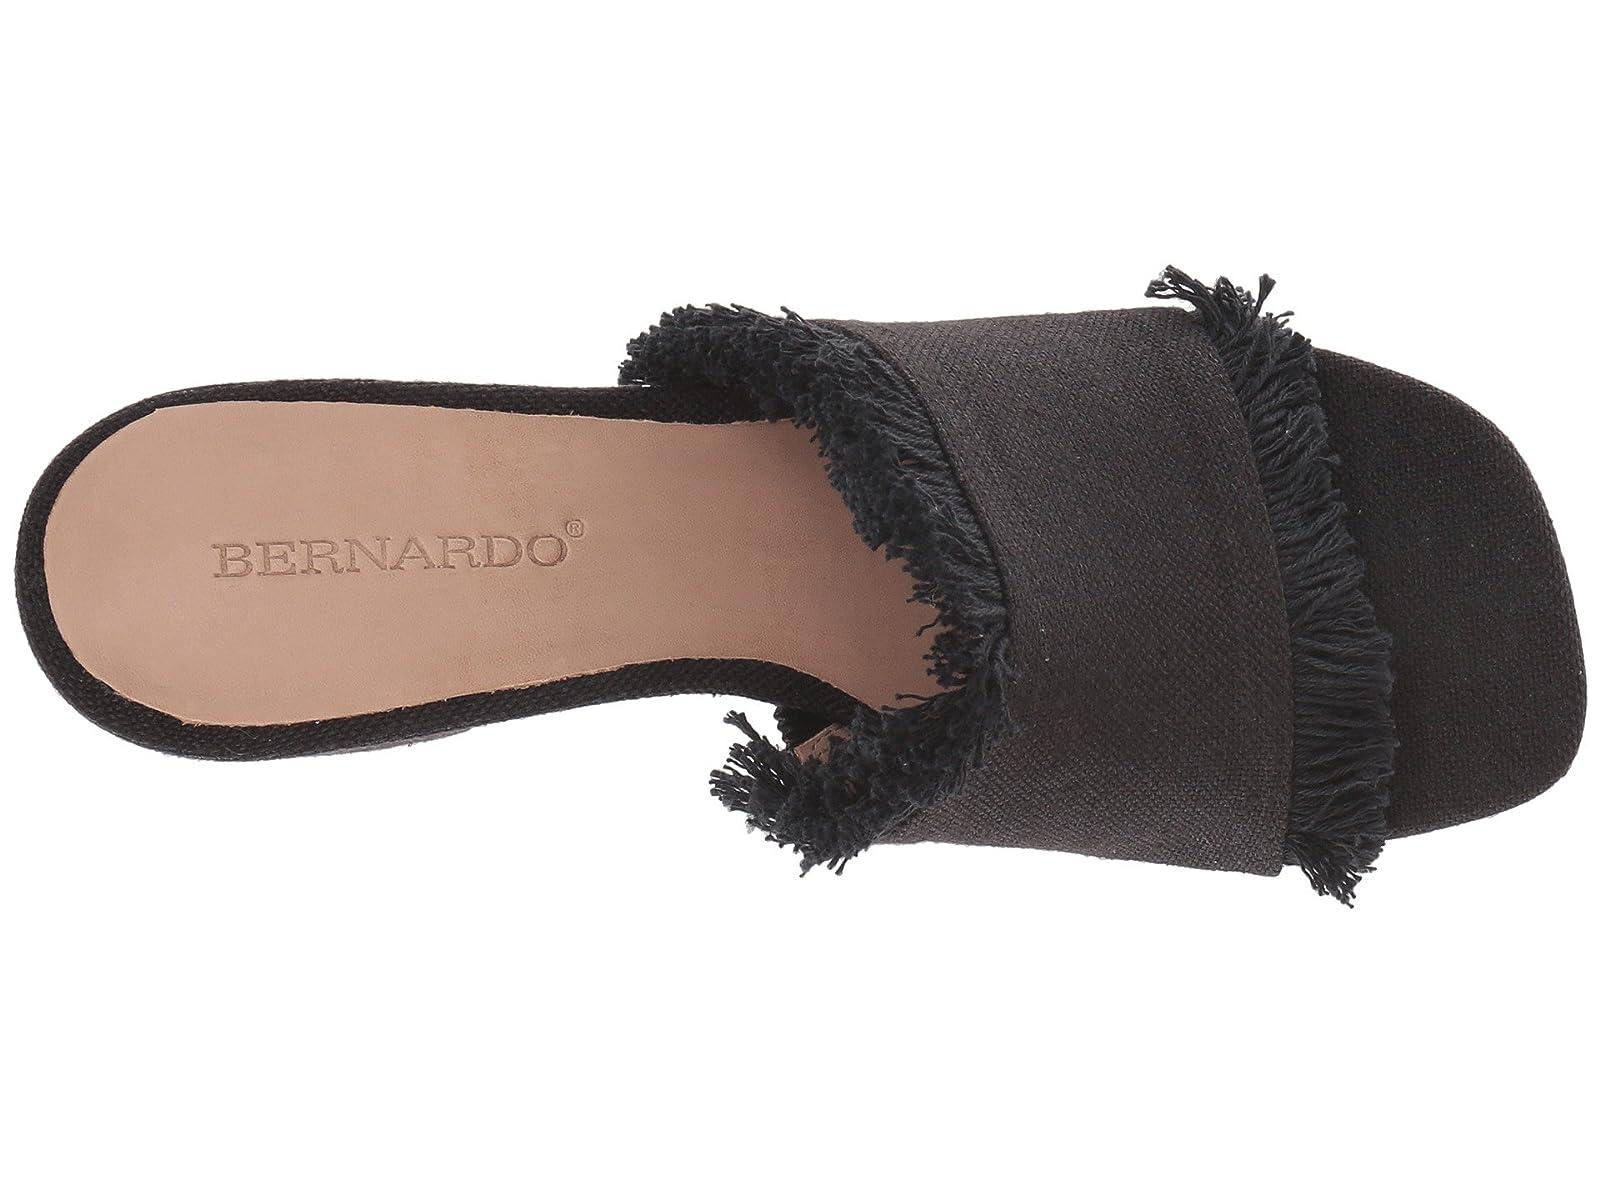 Men's/Women's Bernardo Blaire   Modern And Elegant In In In Fashion d58f40